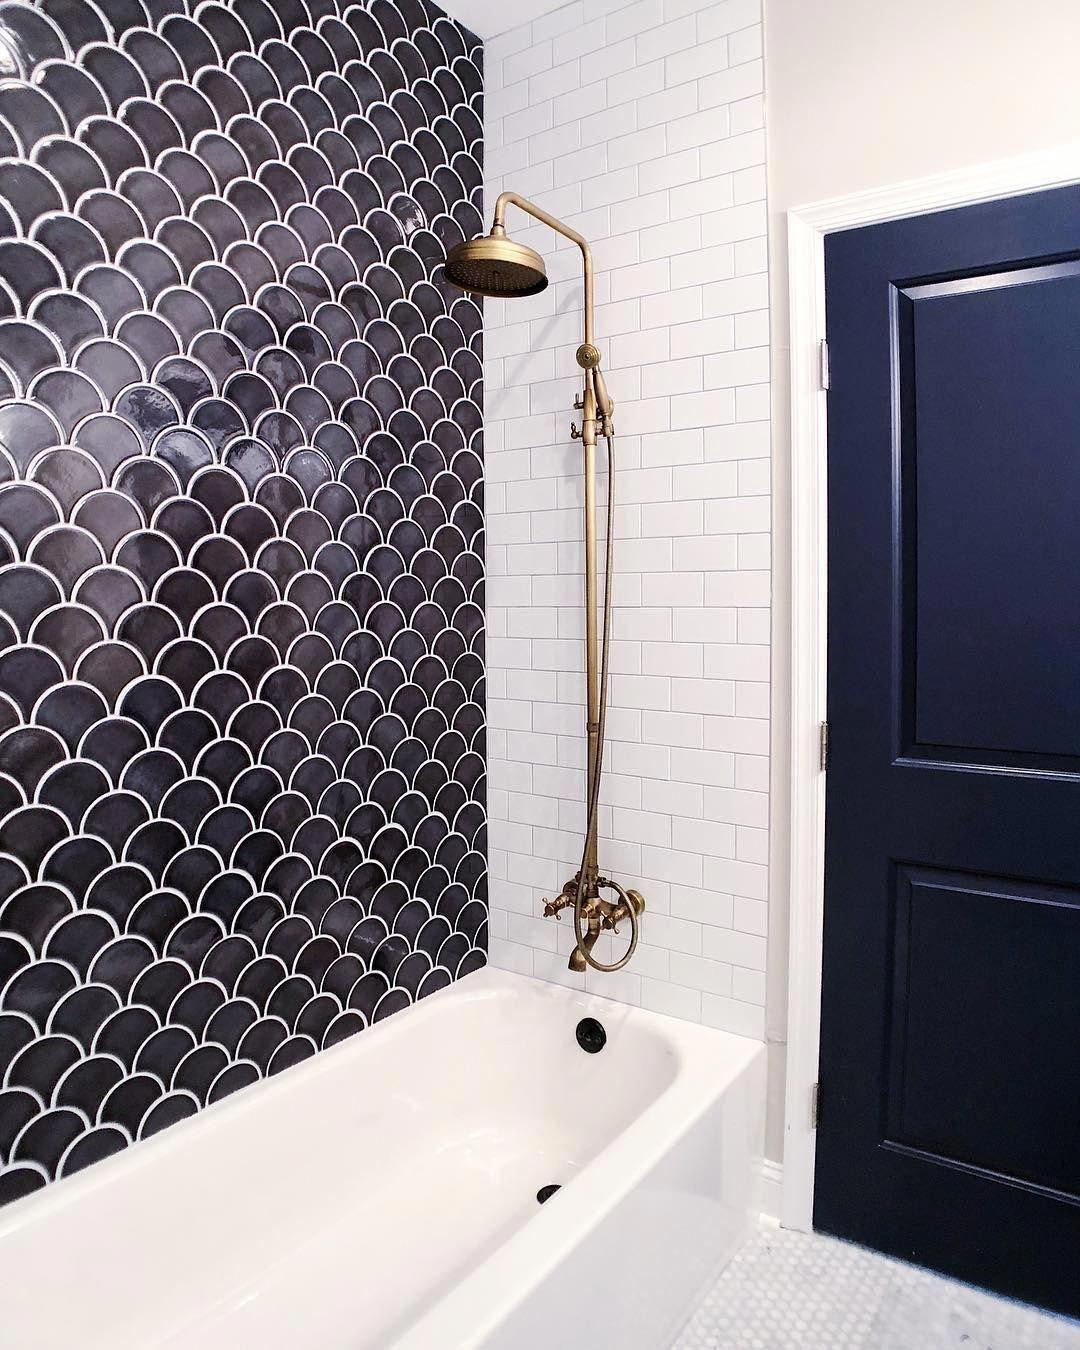 Top bathroom floor tile cleaner for your cozy home # ...